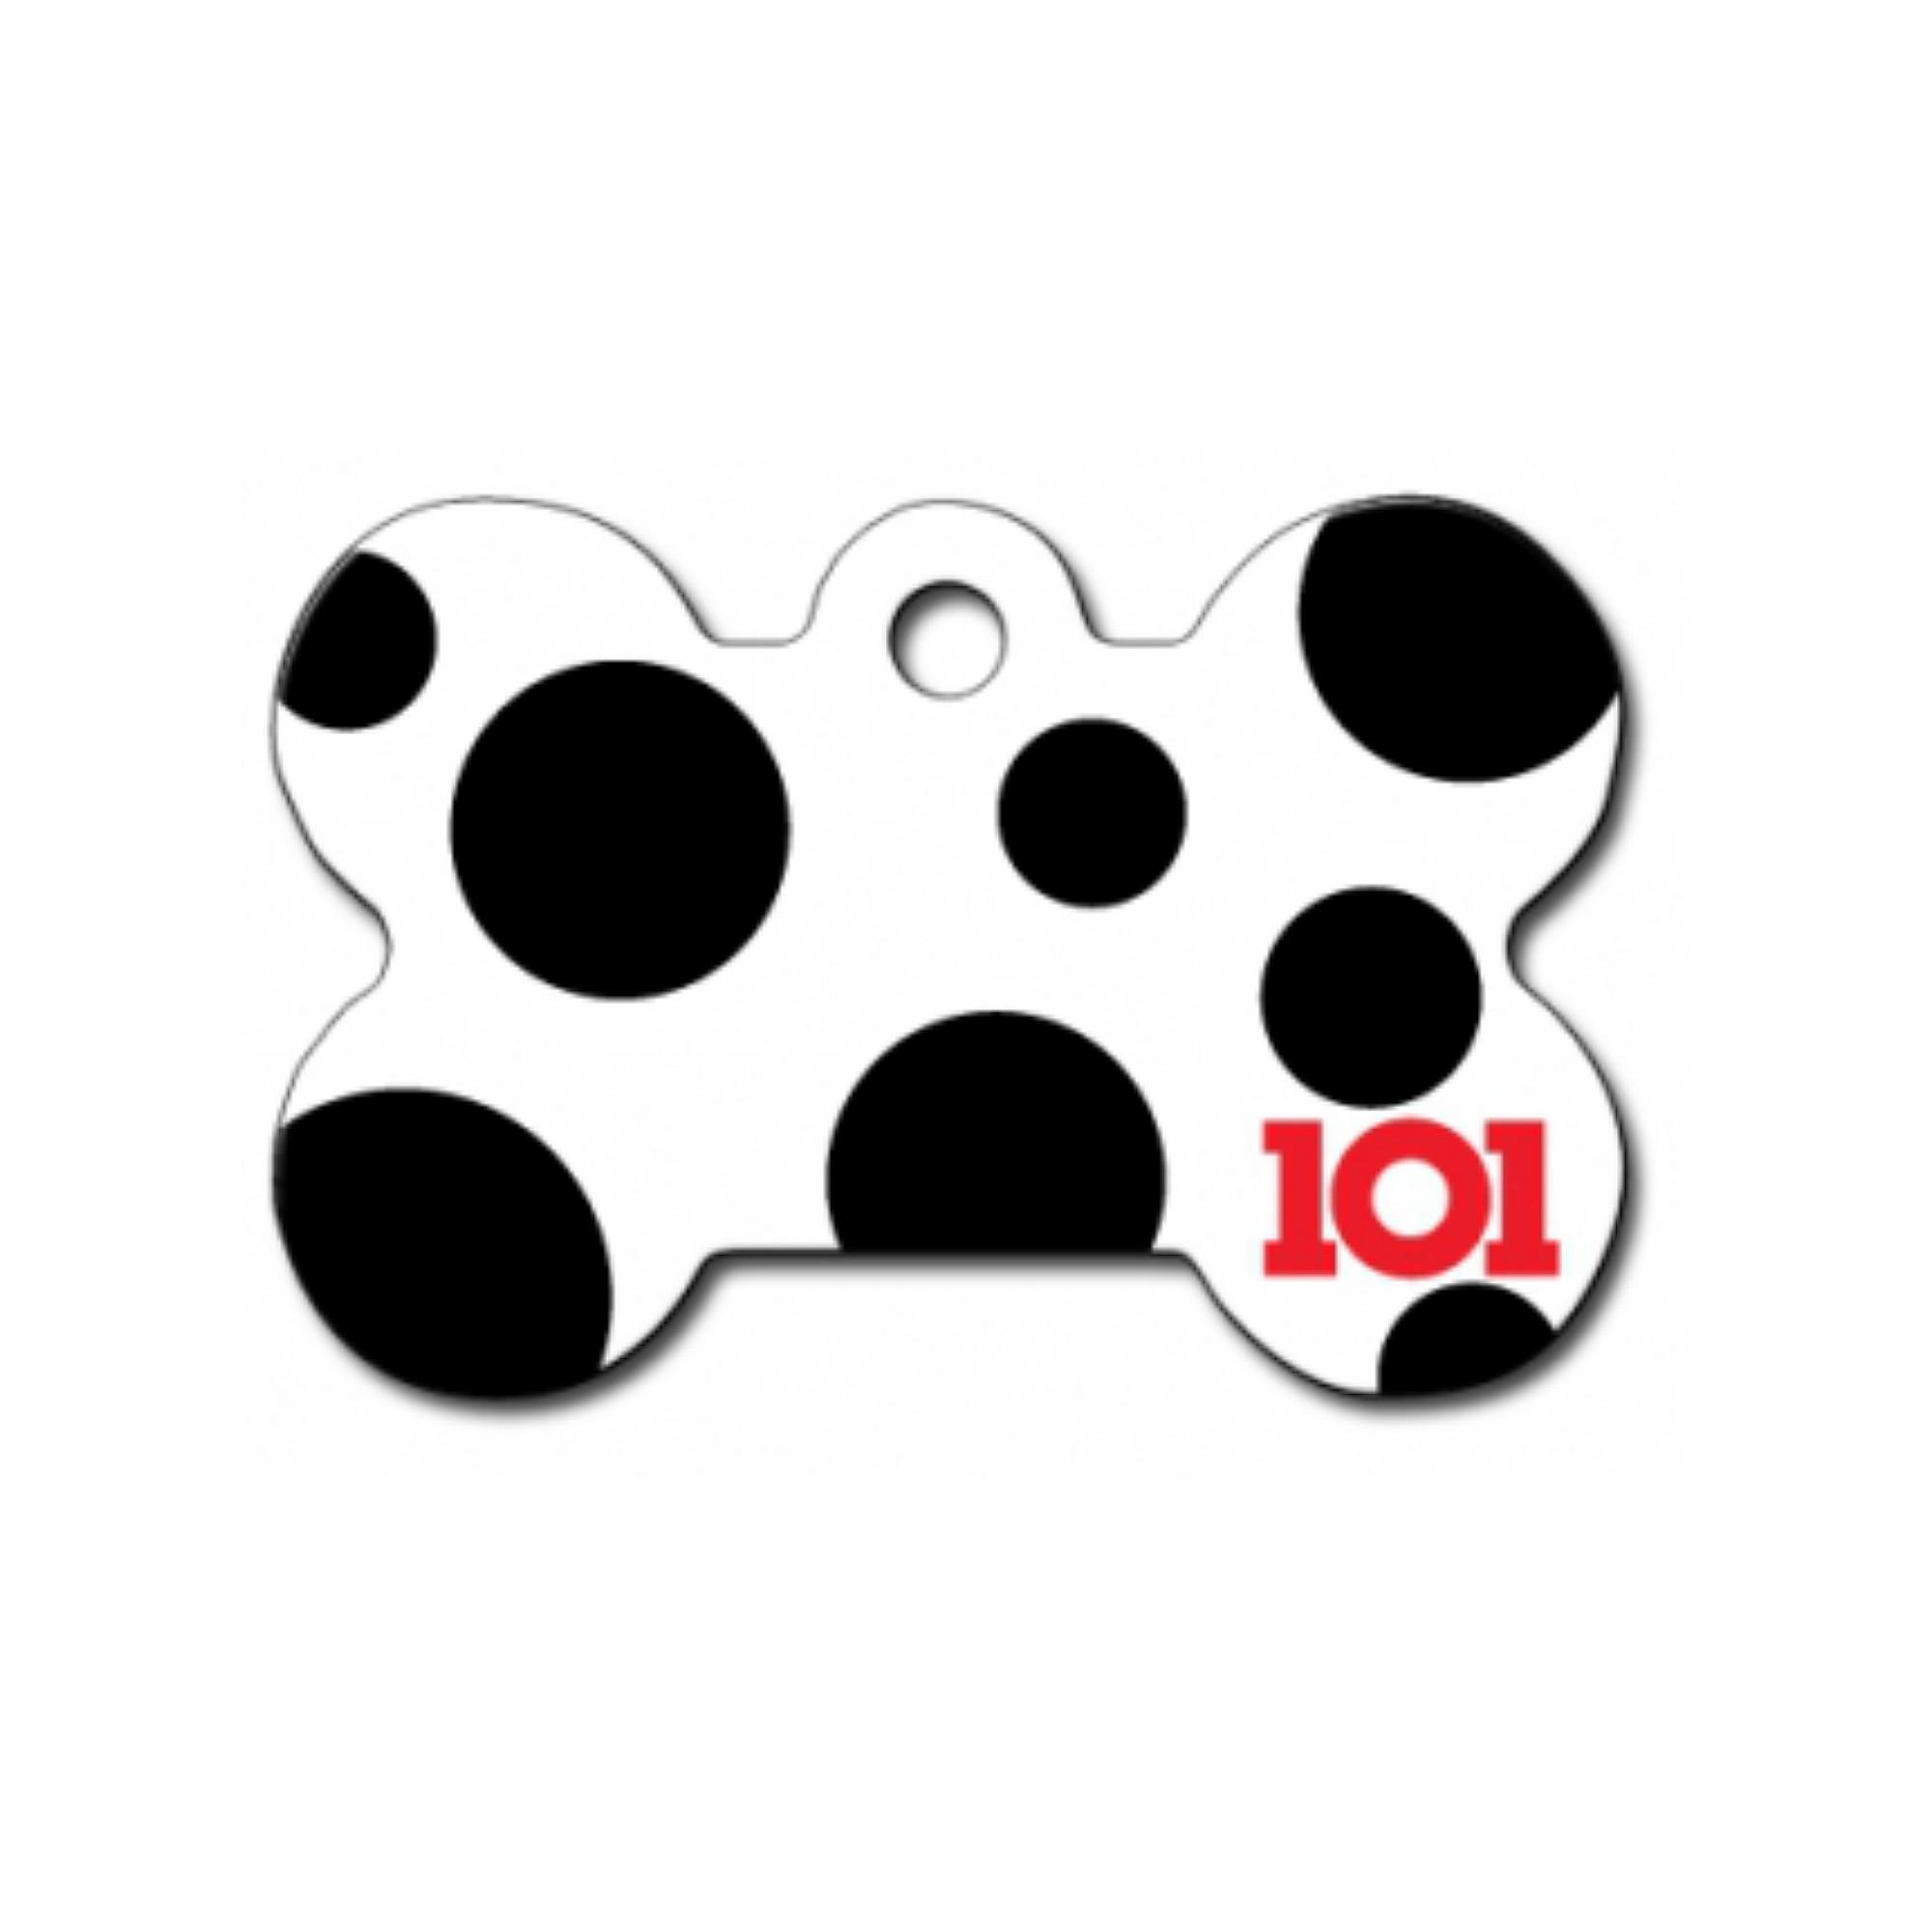 Disney© 101 Dalmations Bone Large Engravable Pet I.D. Tag